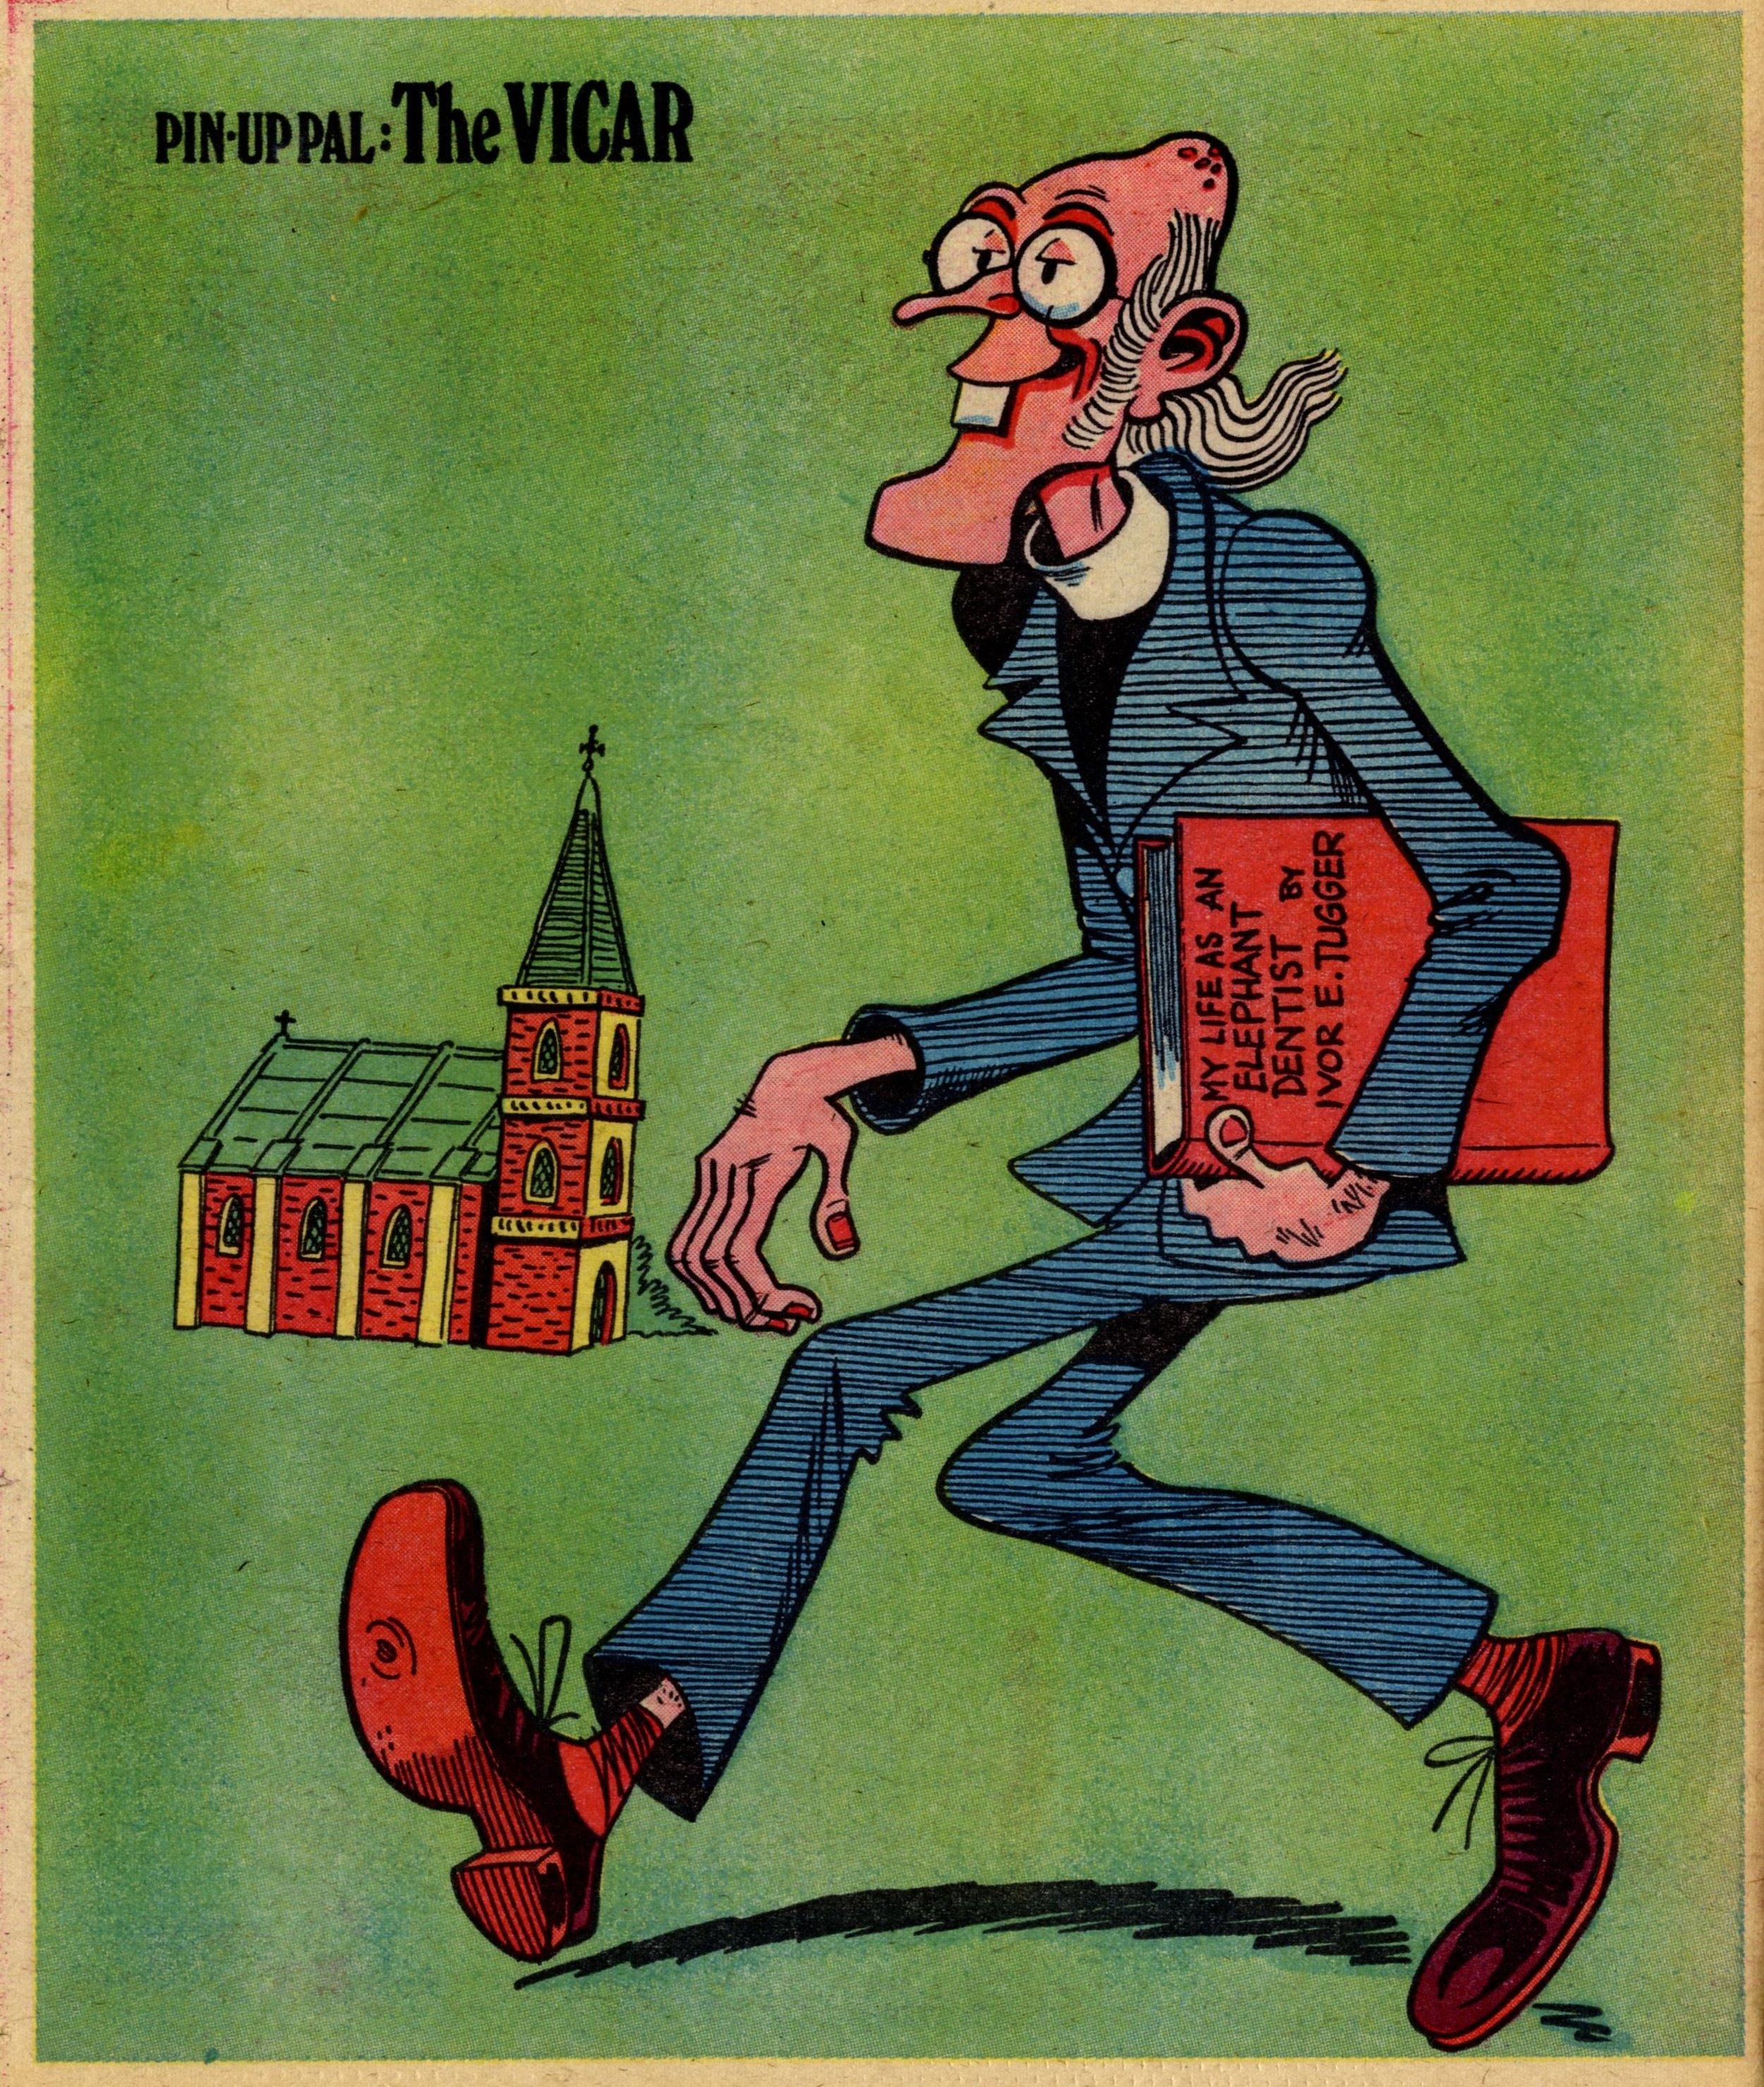 Pin-up Pal: The Vicar (artist Frank McDiarmid), 11 March 1978